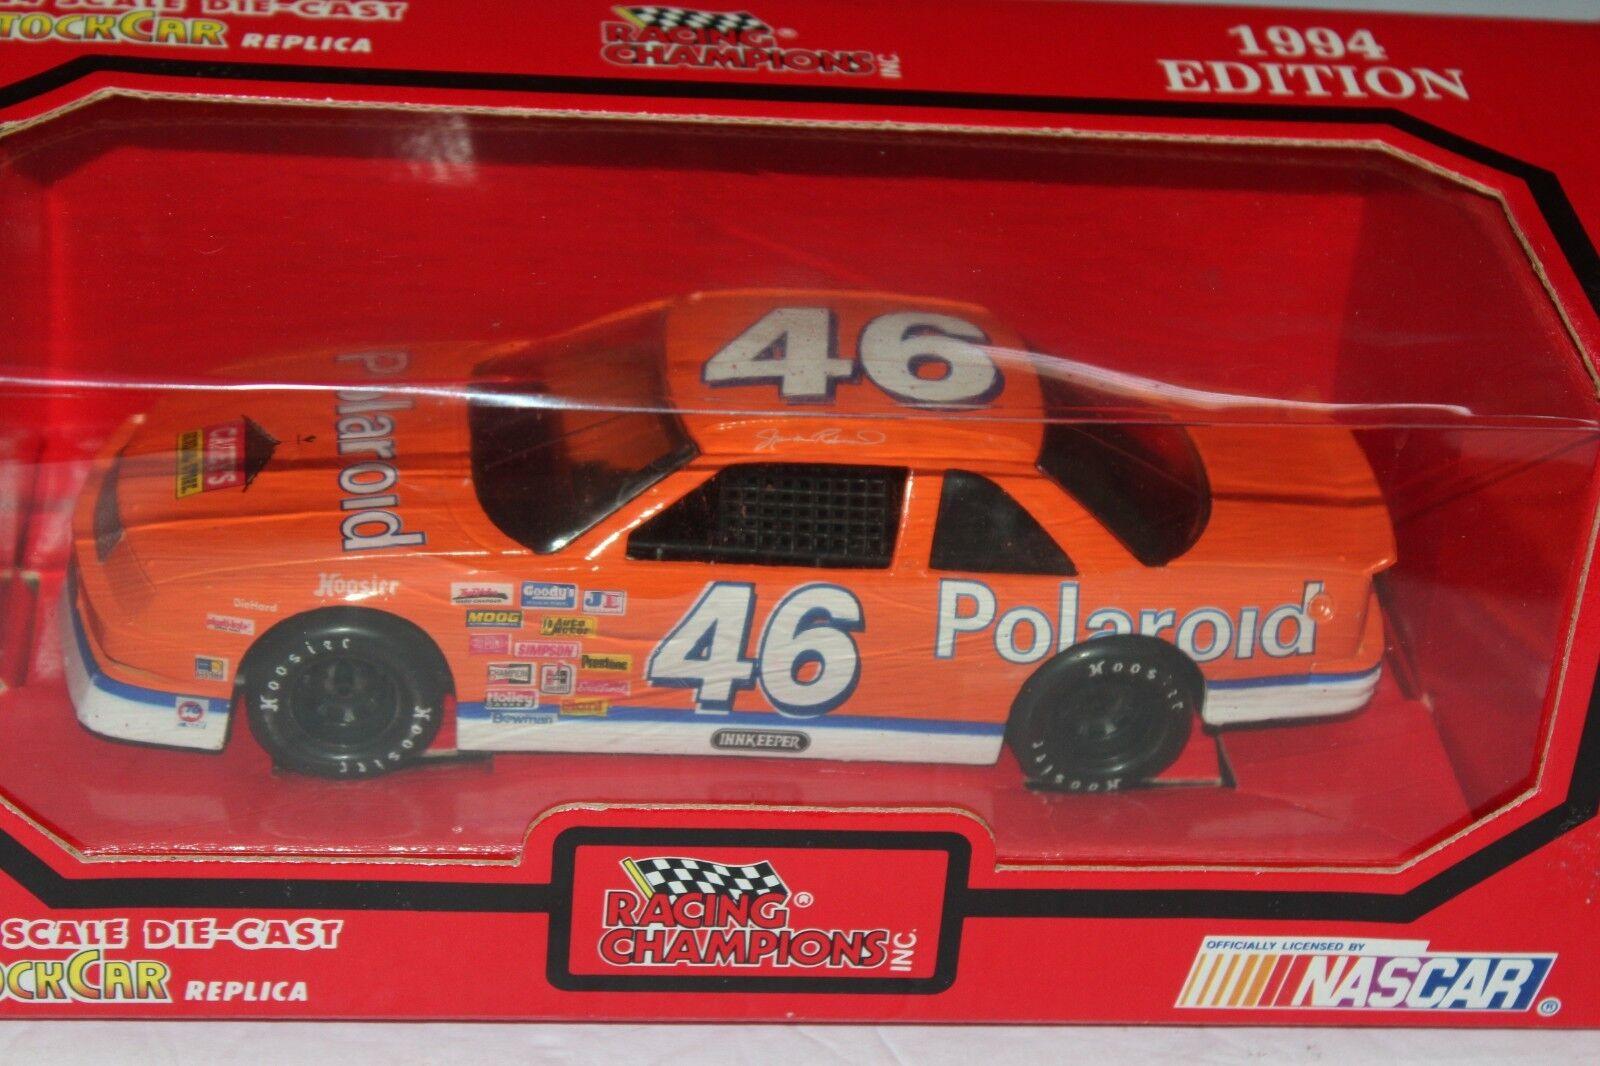 RACING CHAMPIONS SHAWNA ROBINSON CHEVROLET LUMINA NASCAR RACE CAR    IN BOX